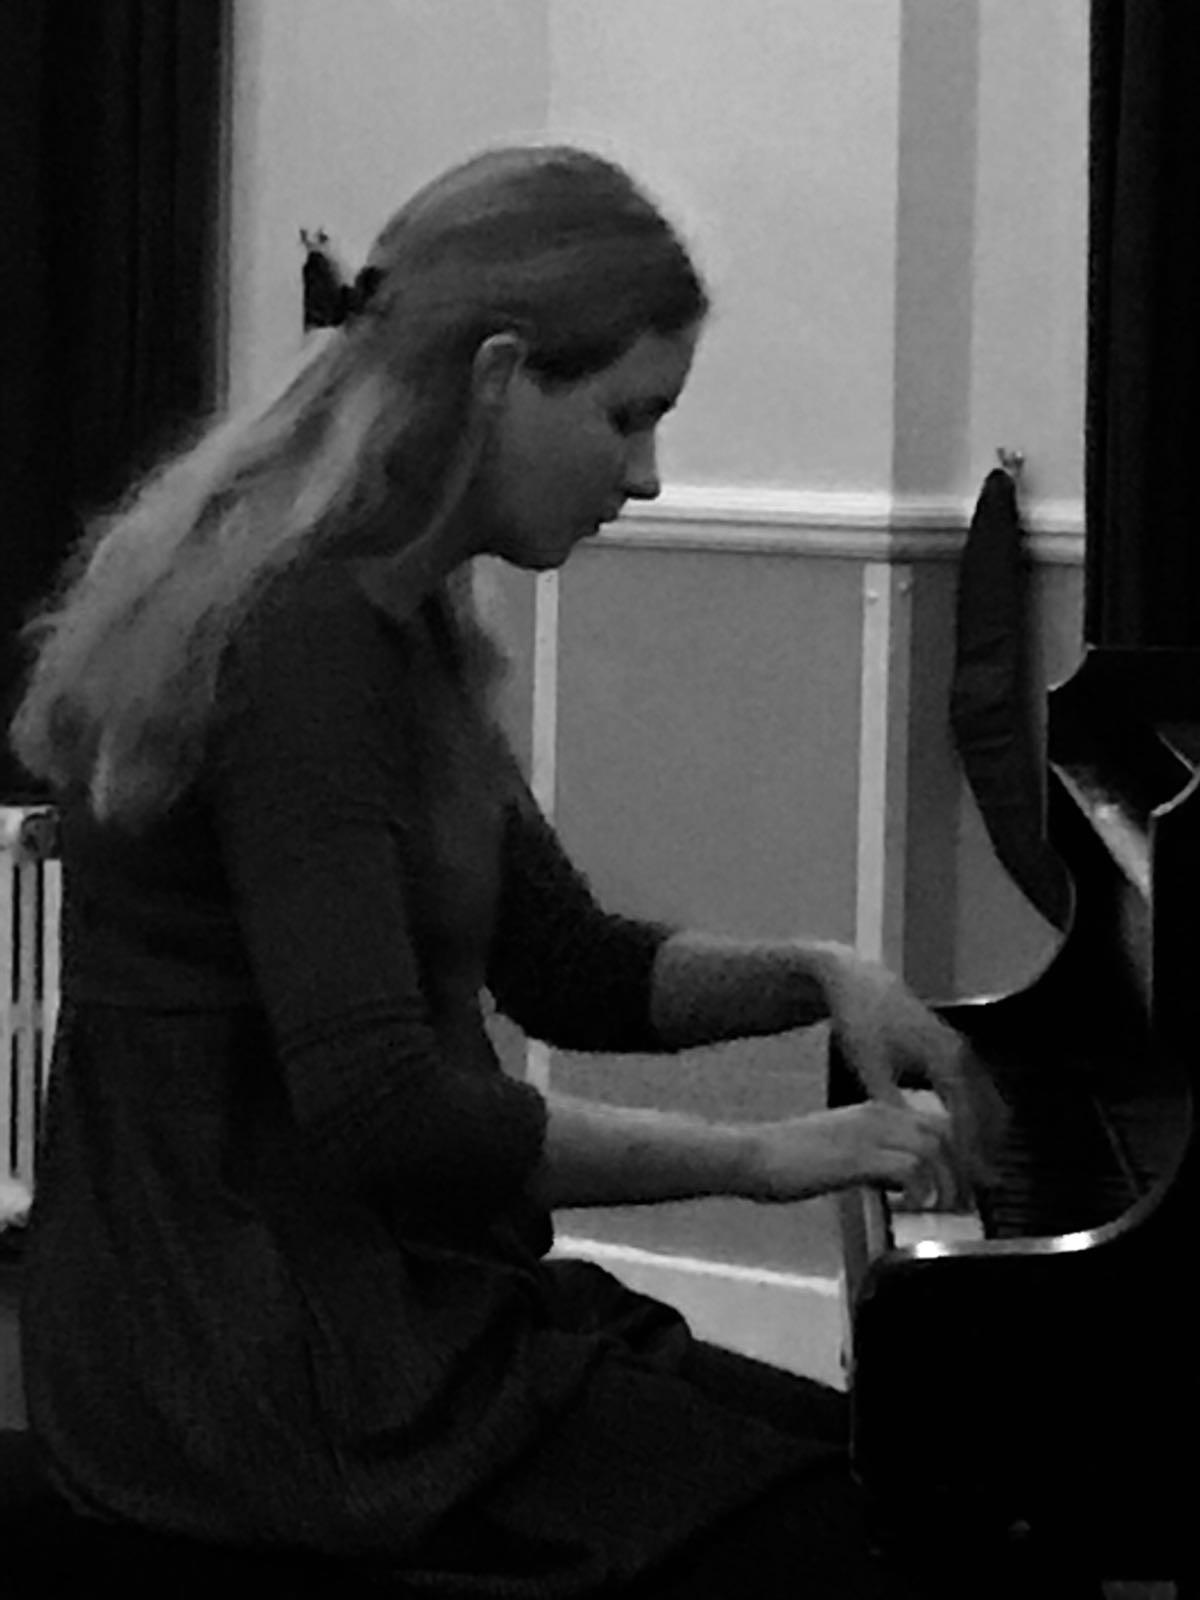 Ksenija Laskova